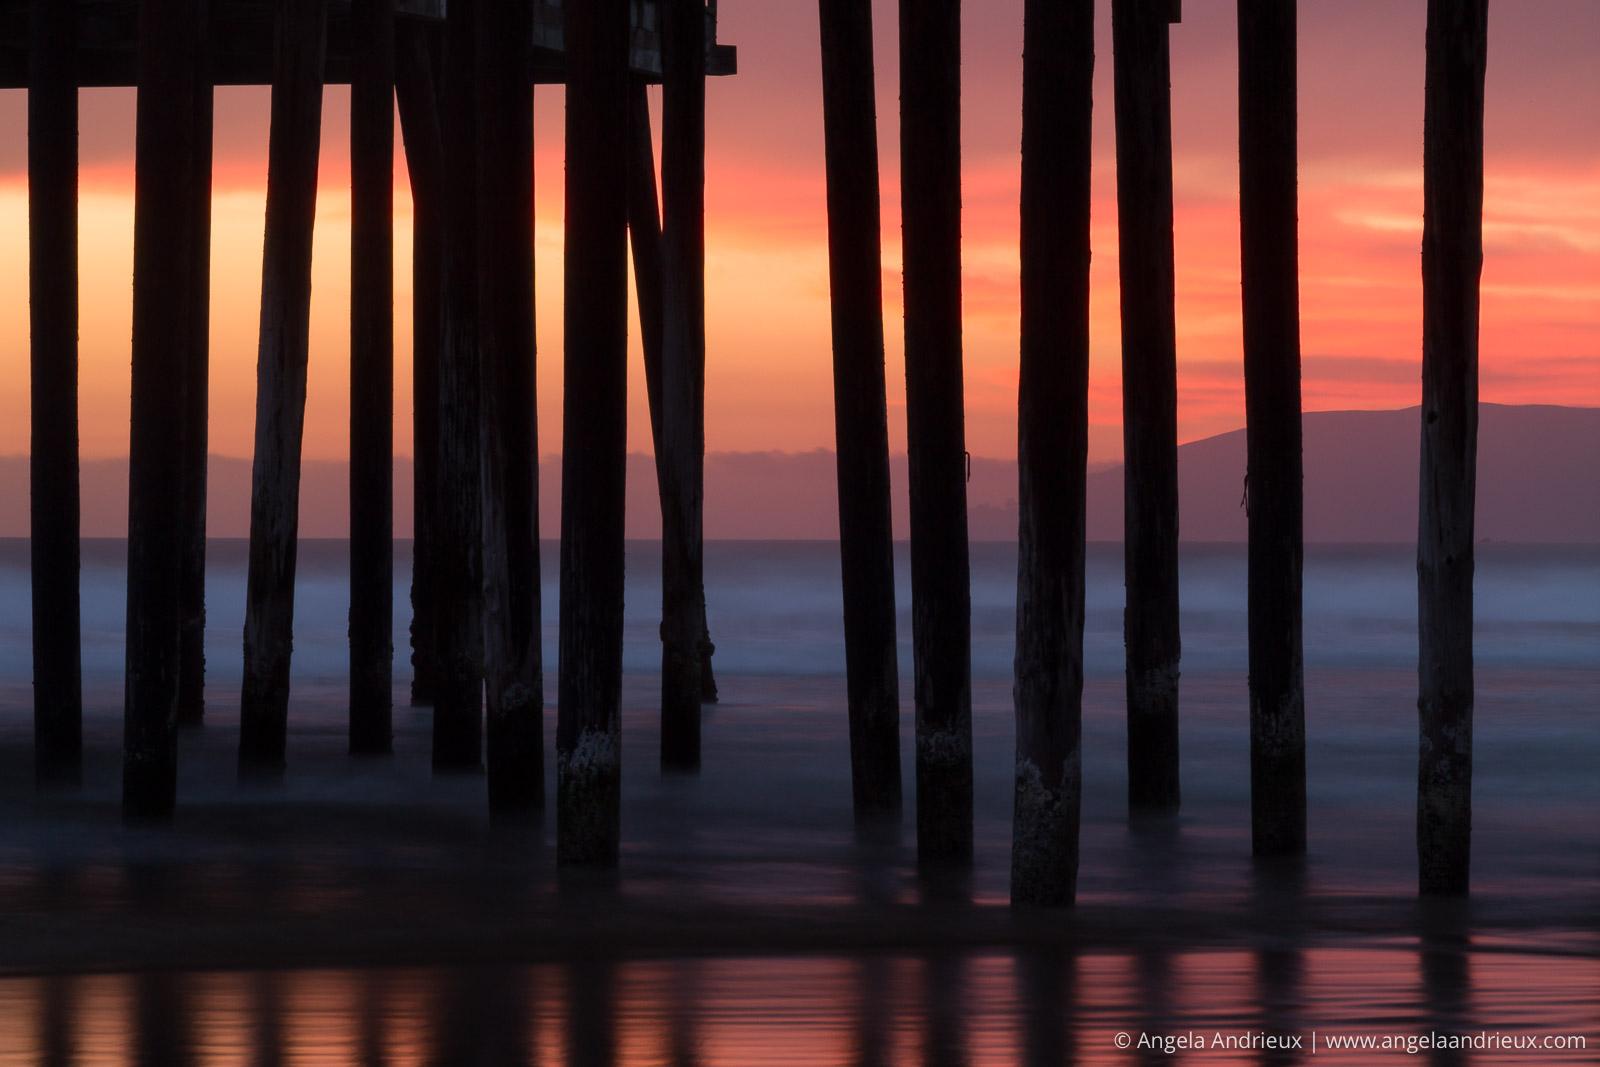 Sunset Silhouette | Pismo Beach, CA